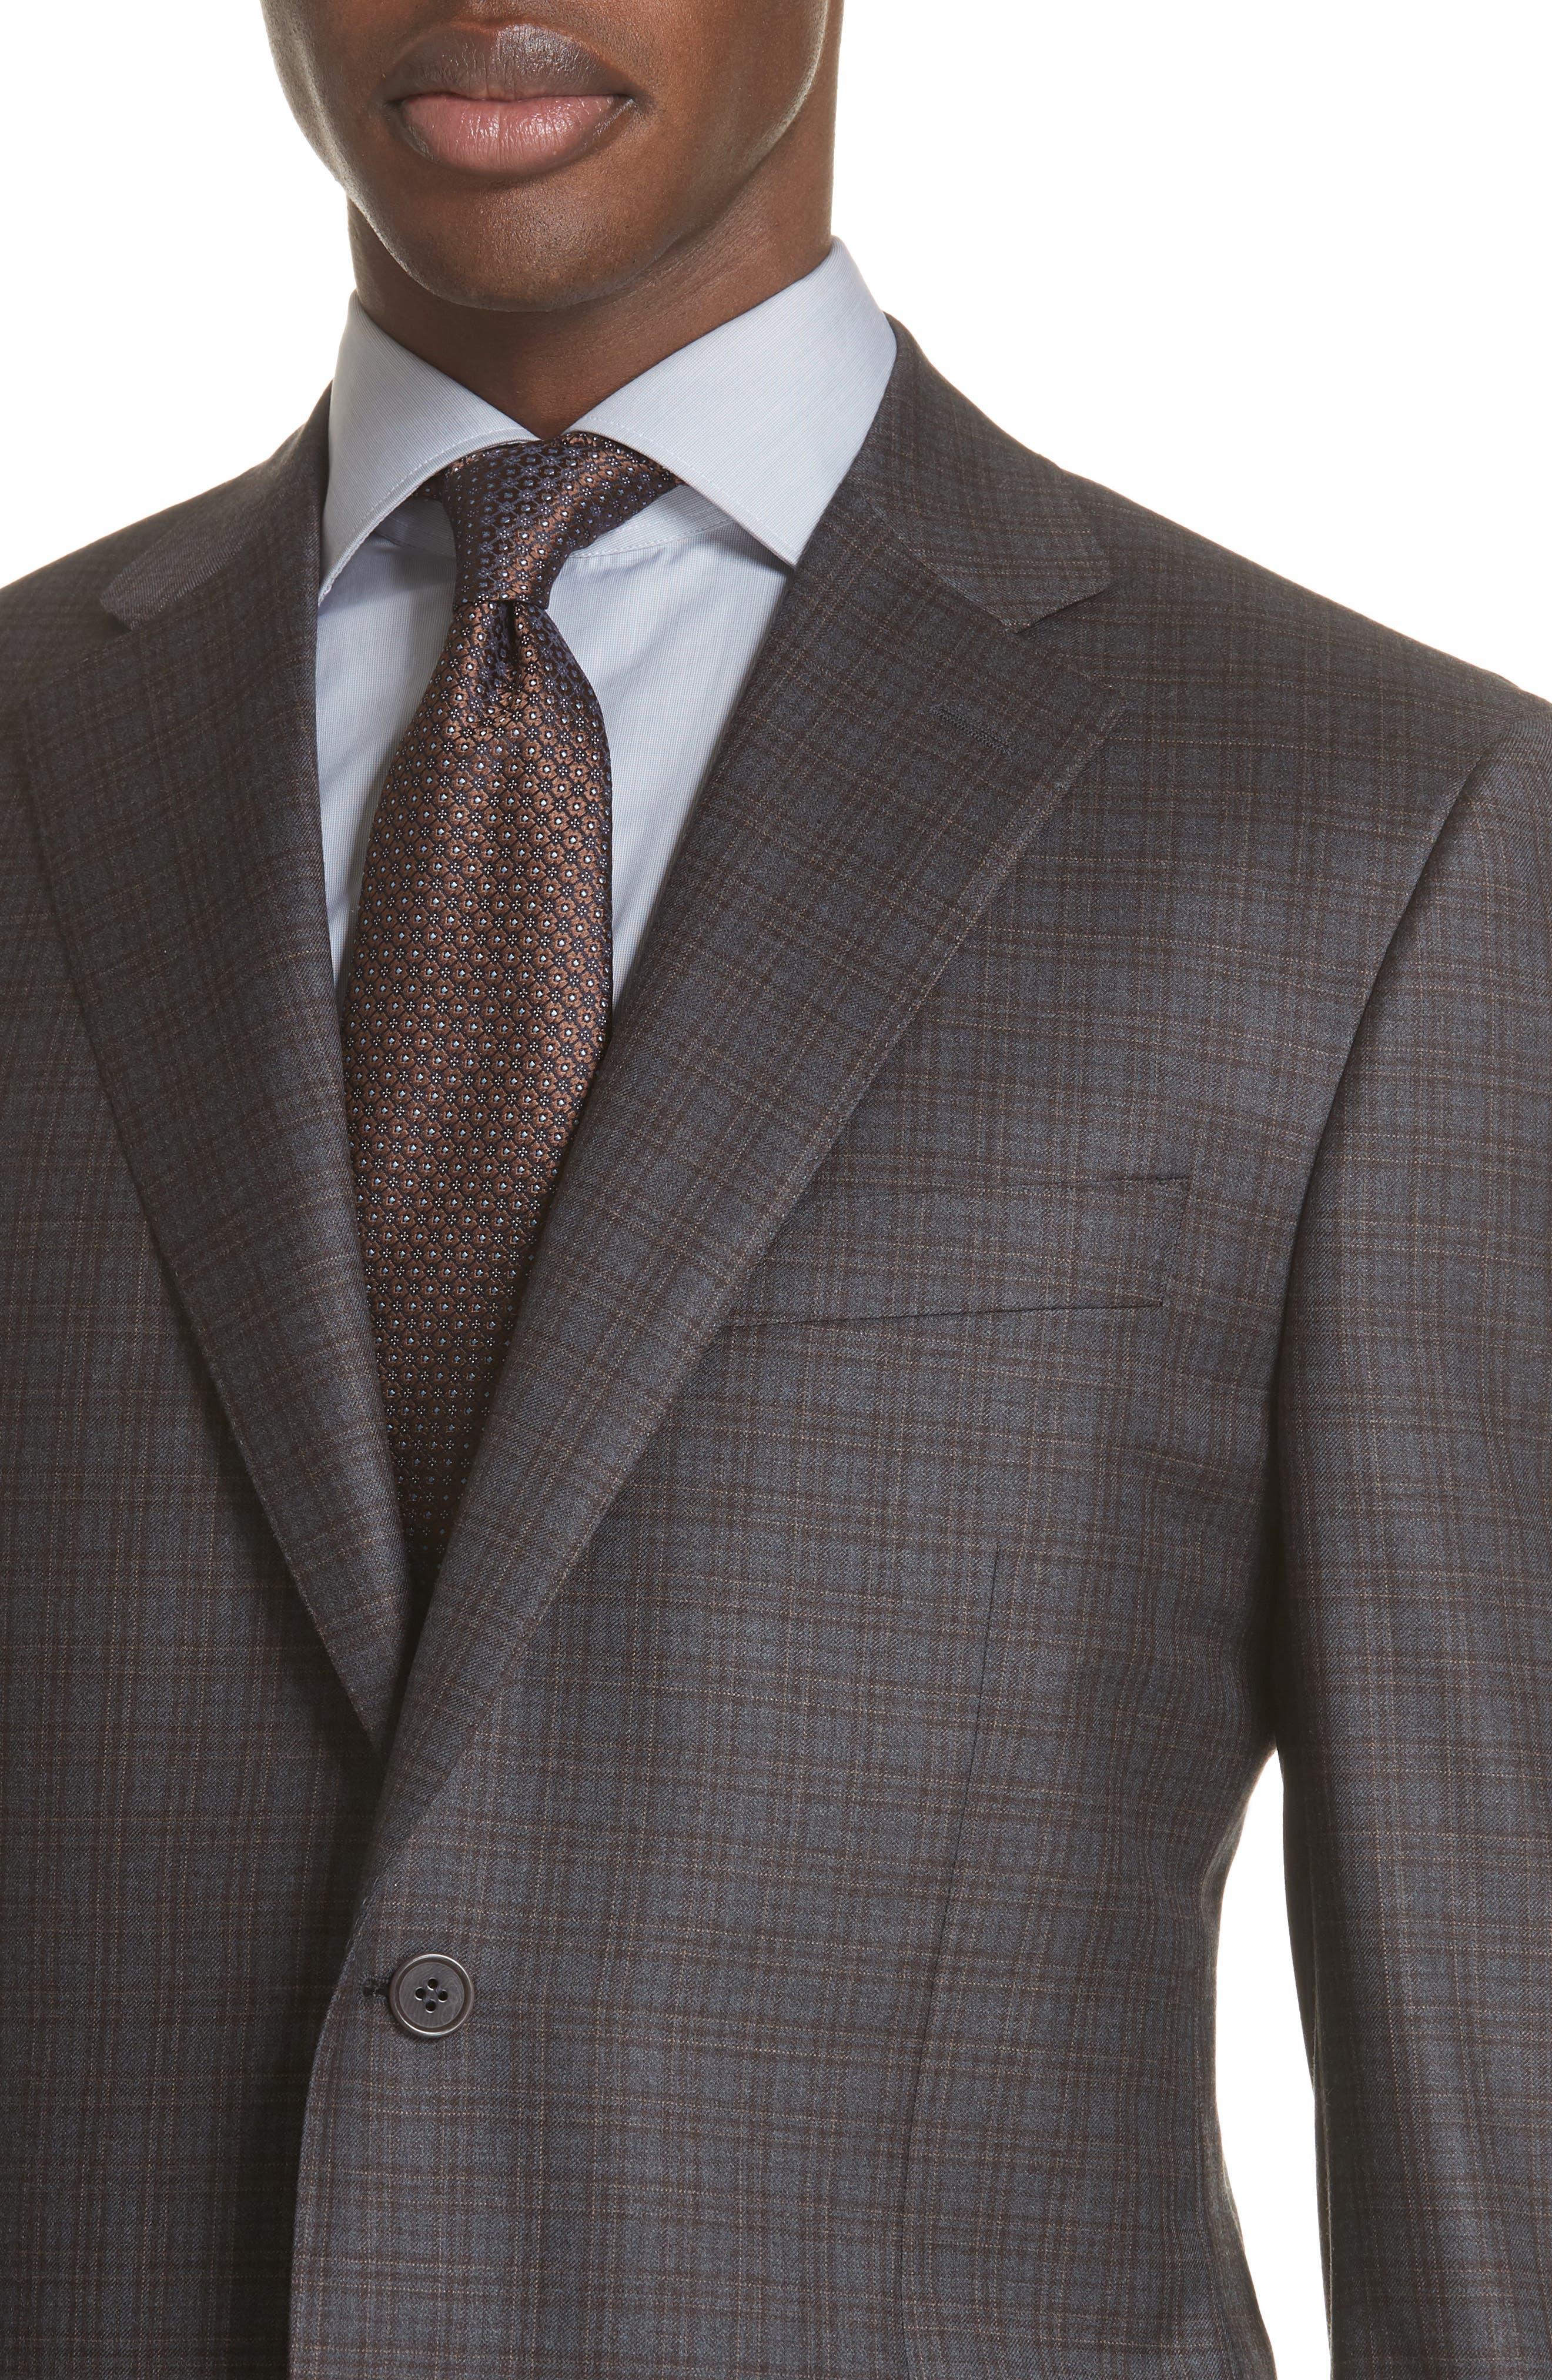 Classic Fit Plaid Wool Sport Coat,                             Alternate thumbnail 4, color,                             GREY/ BROWN